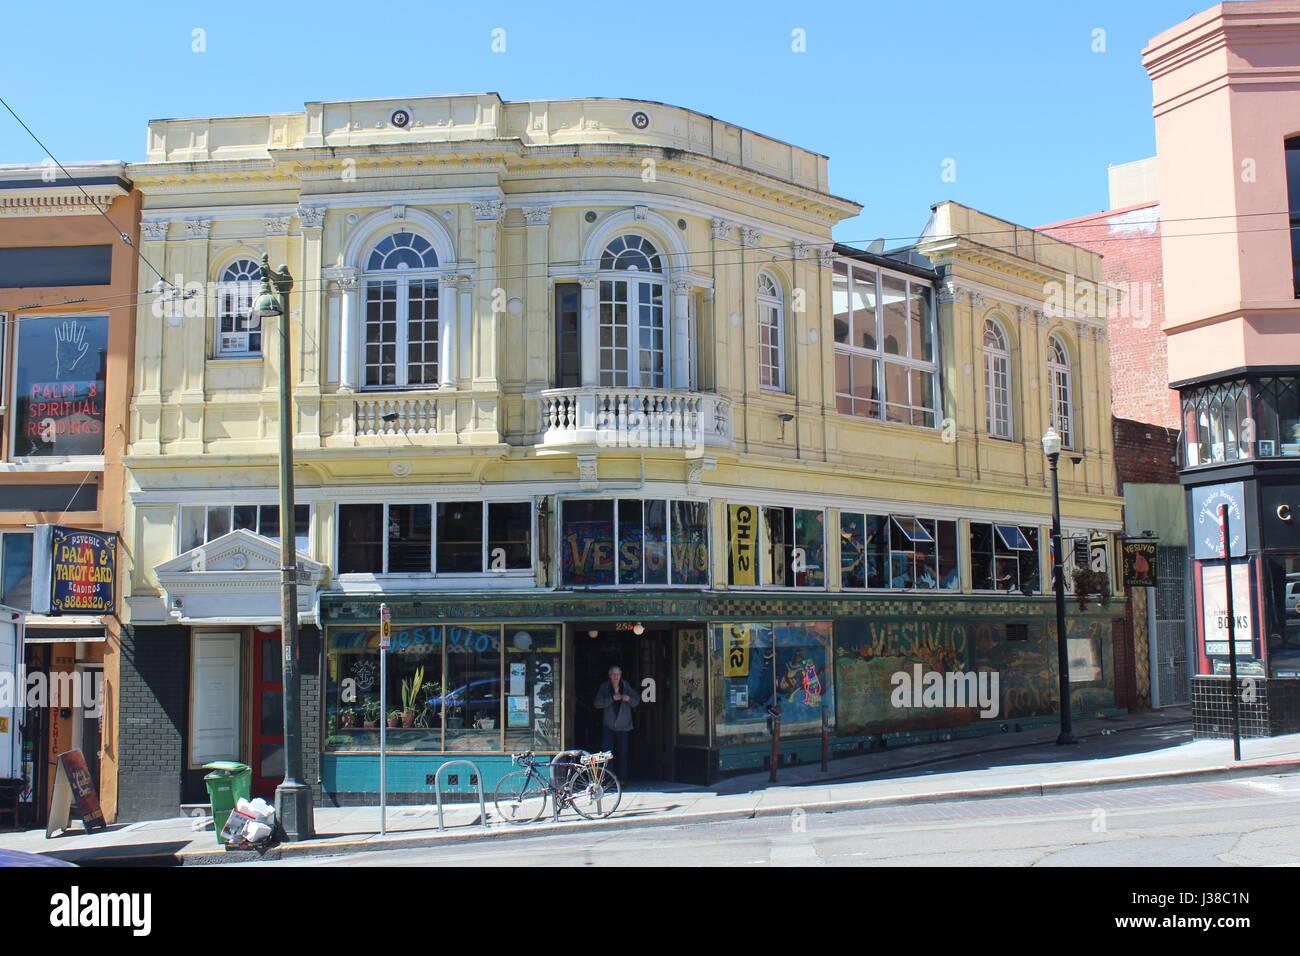 Versuvio Cafe, North Beach, San Francisco - Stock Image